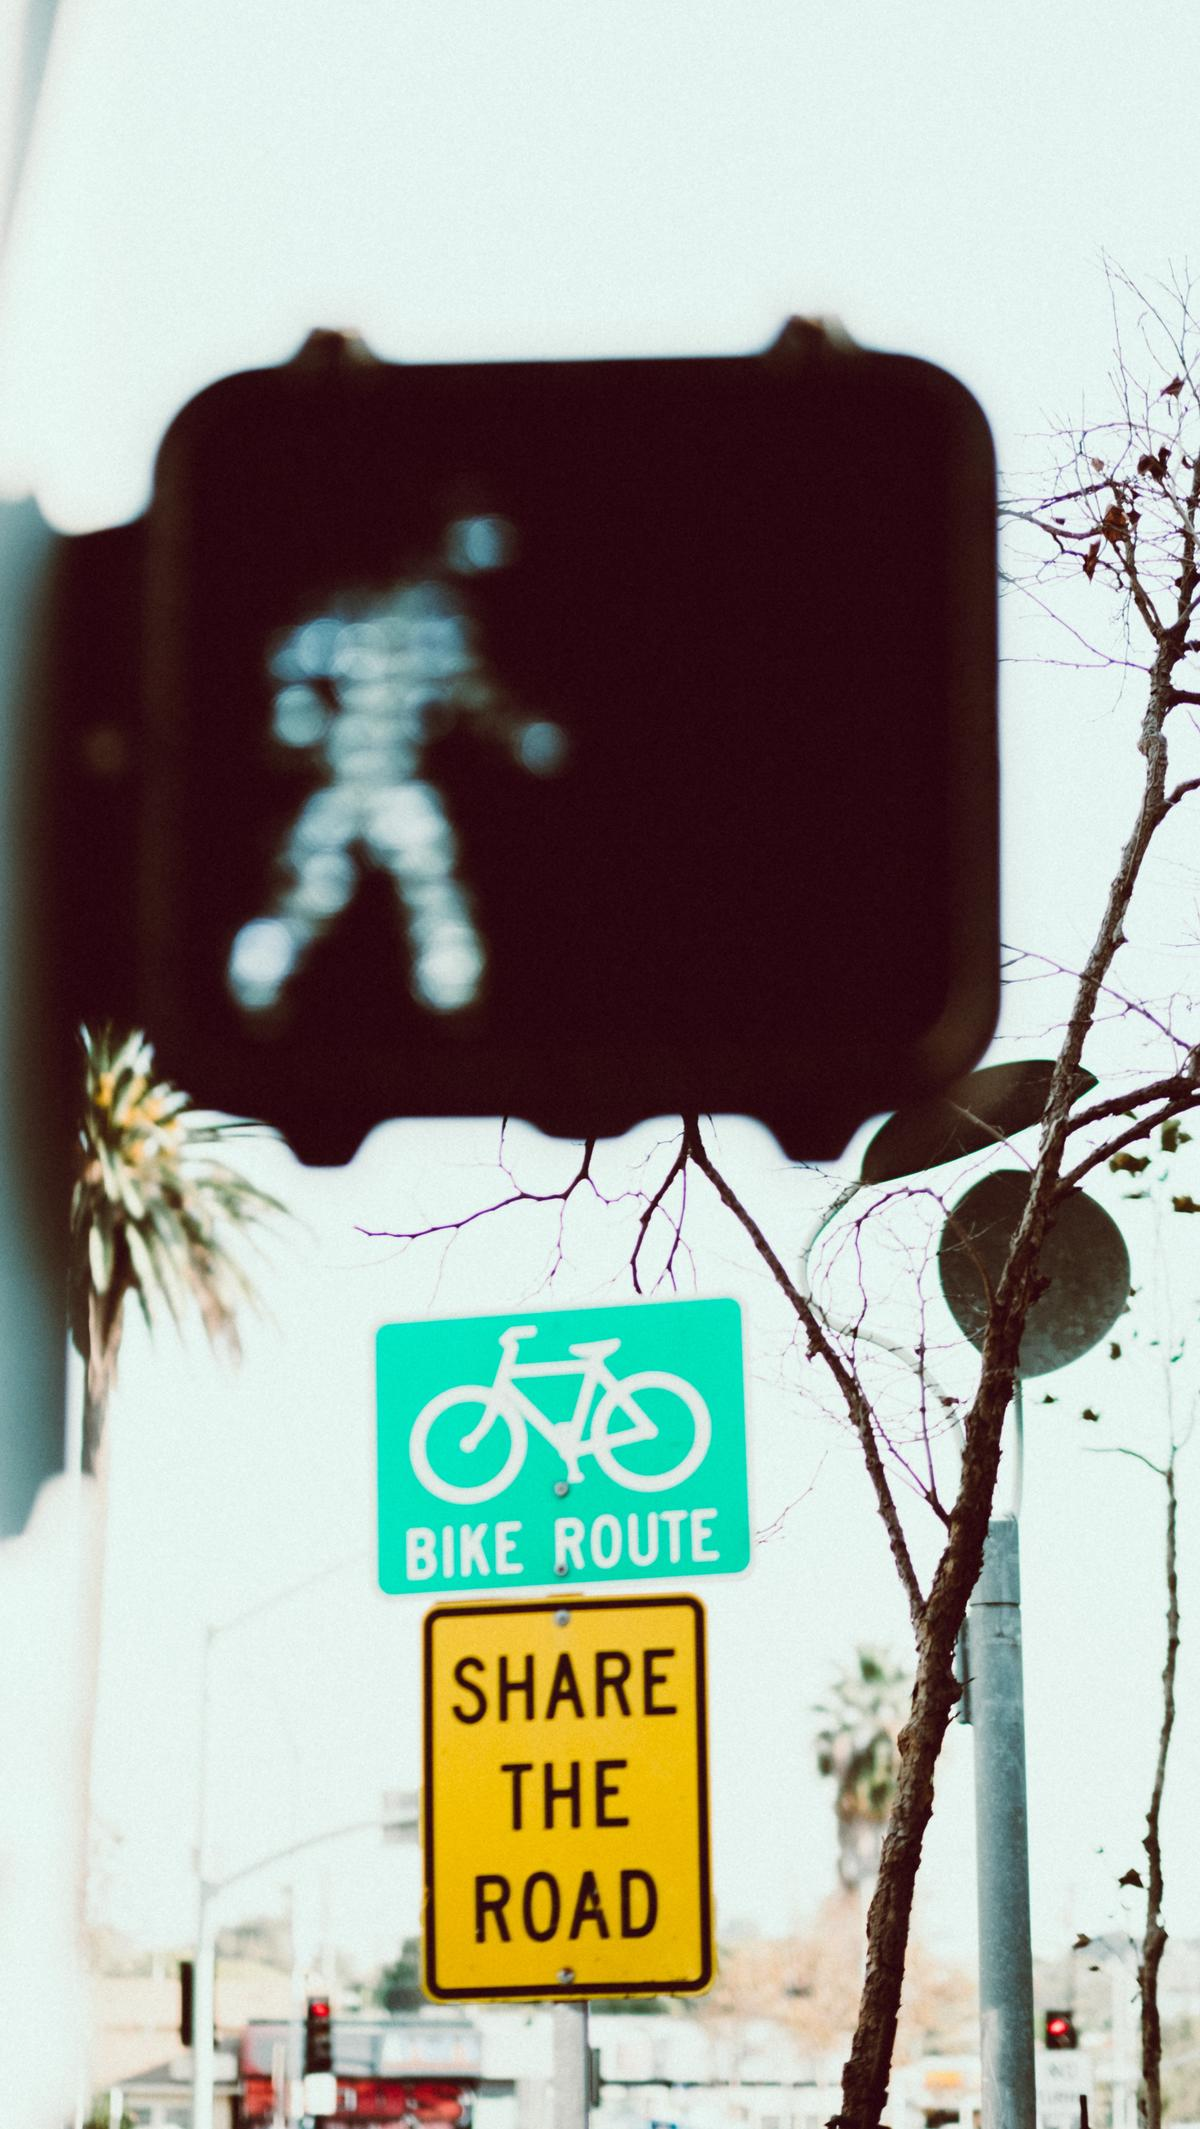 Shared road traffic signals